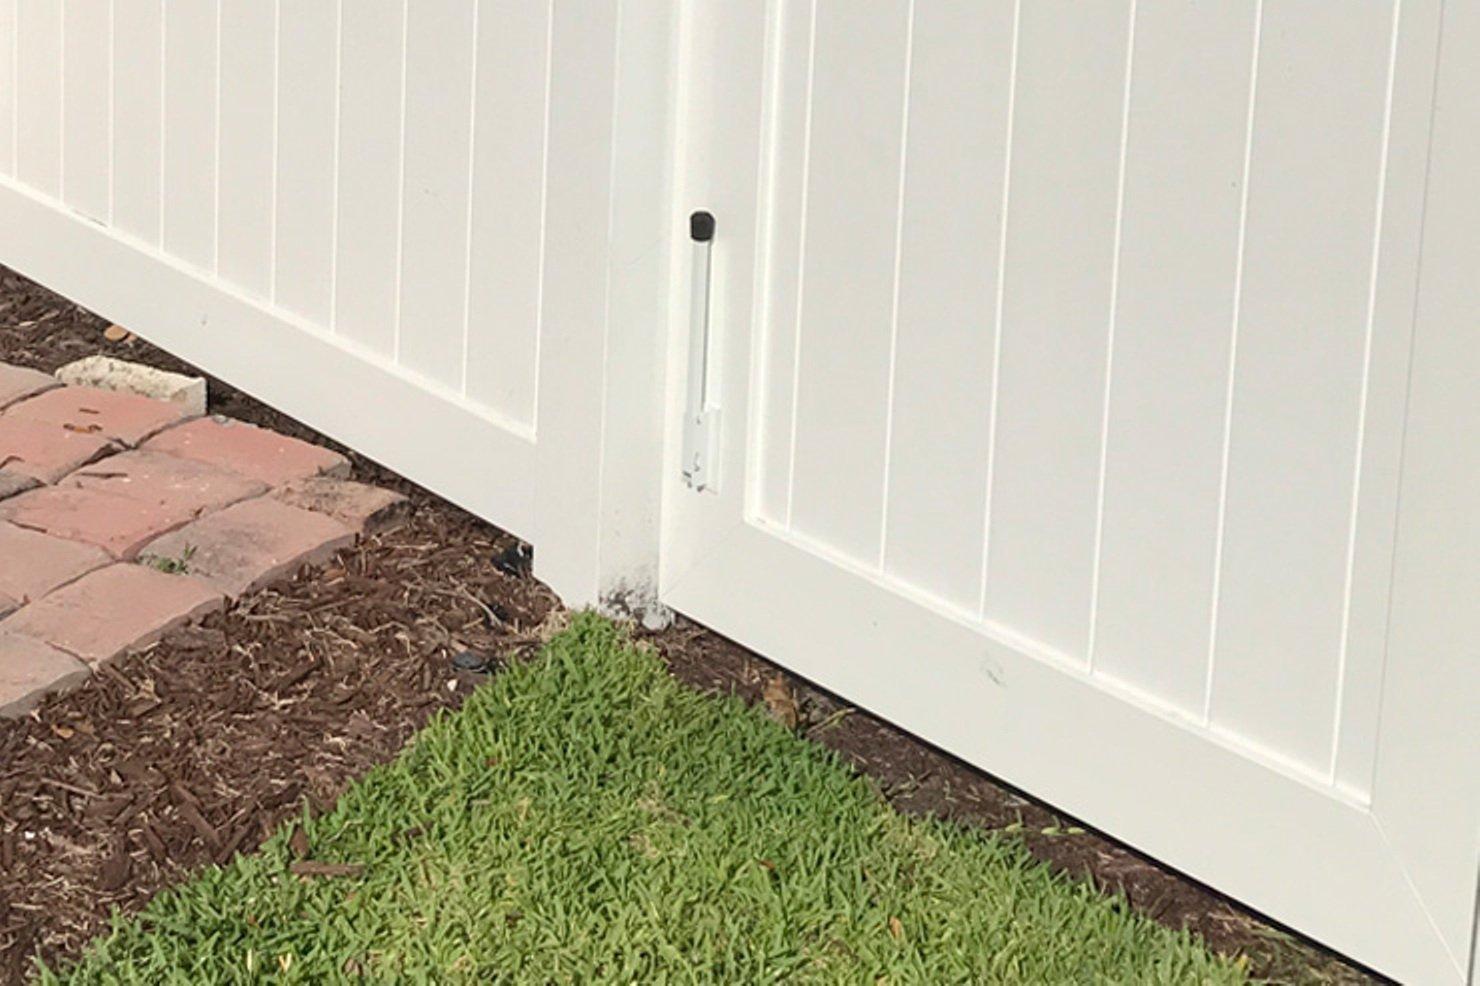 Amazon.com: Tope de puerta de longitud extendida con tirador ...